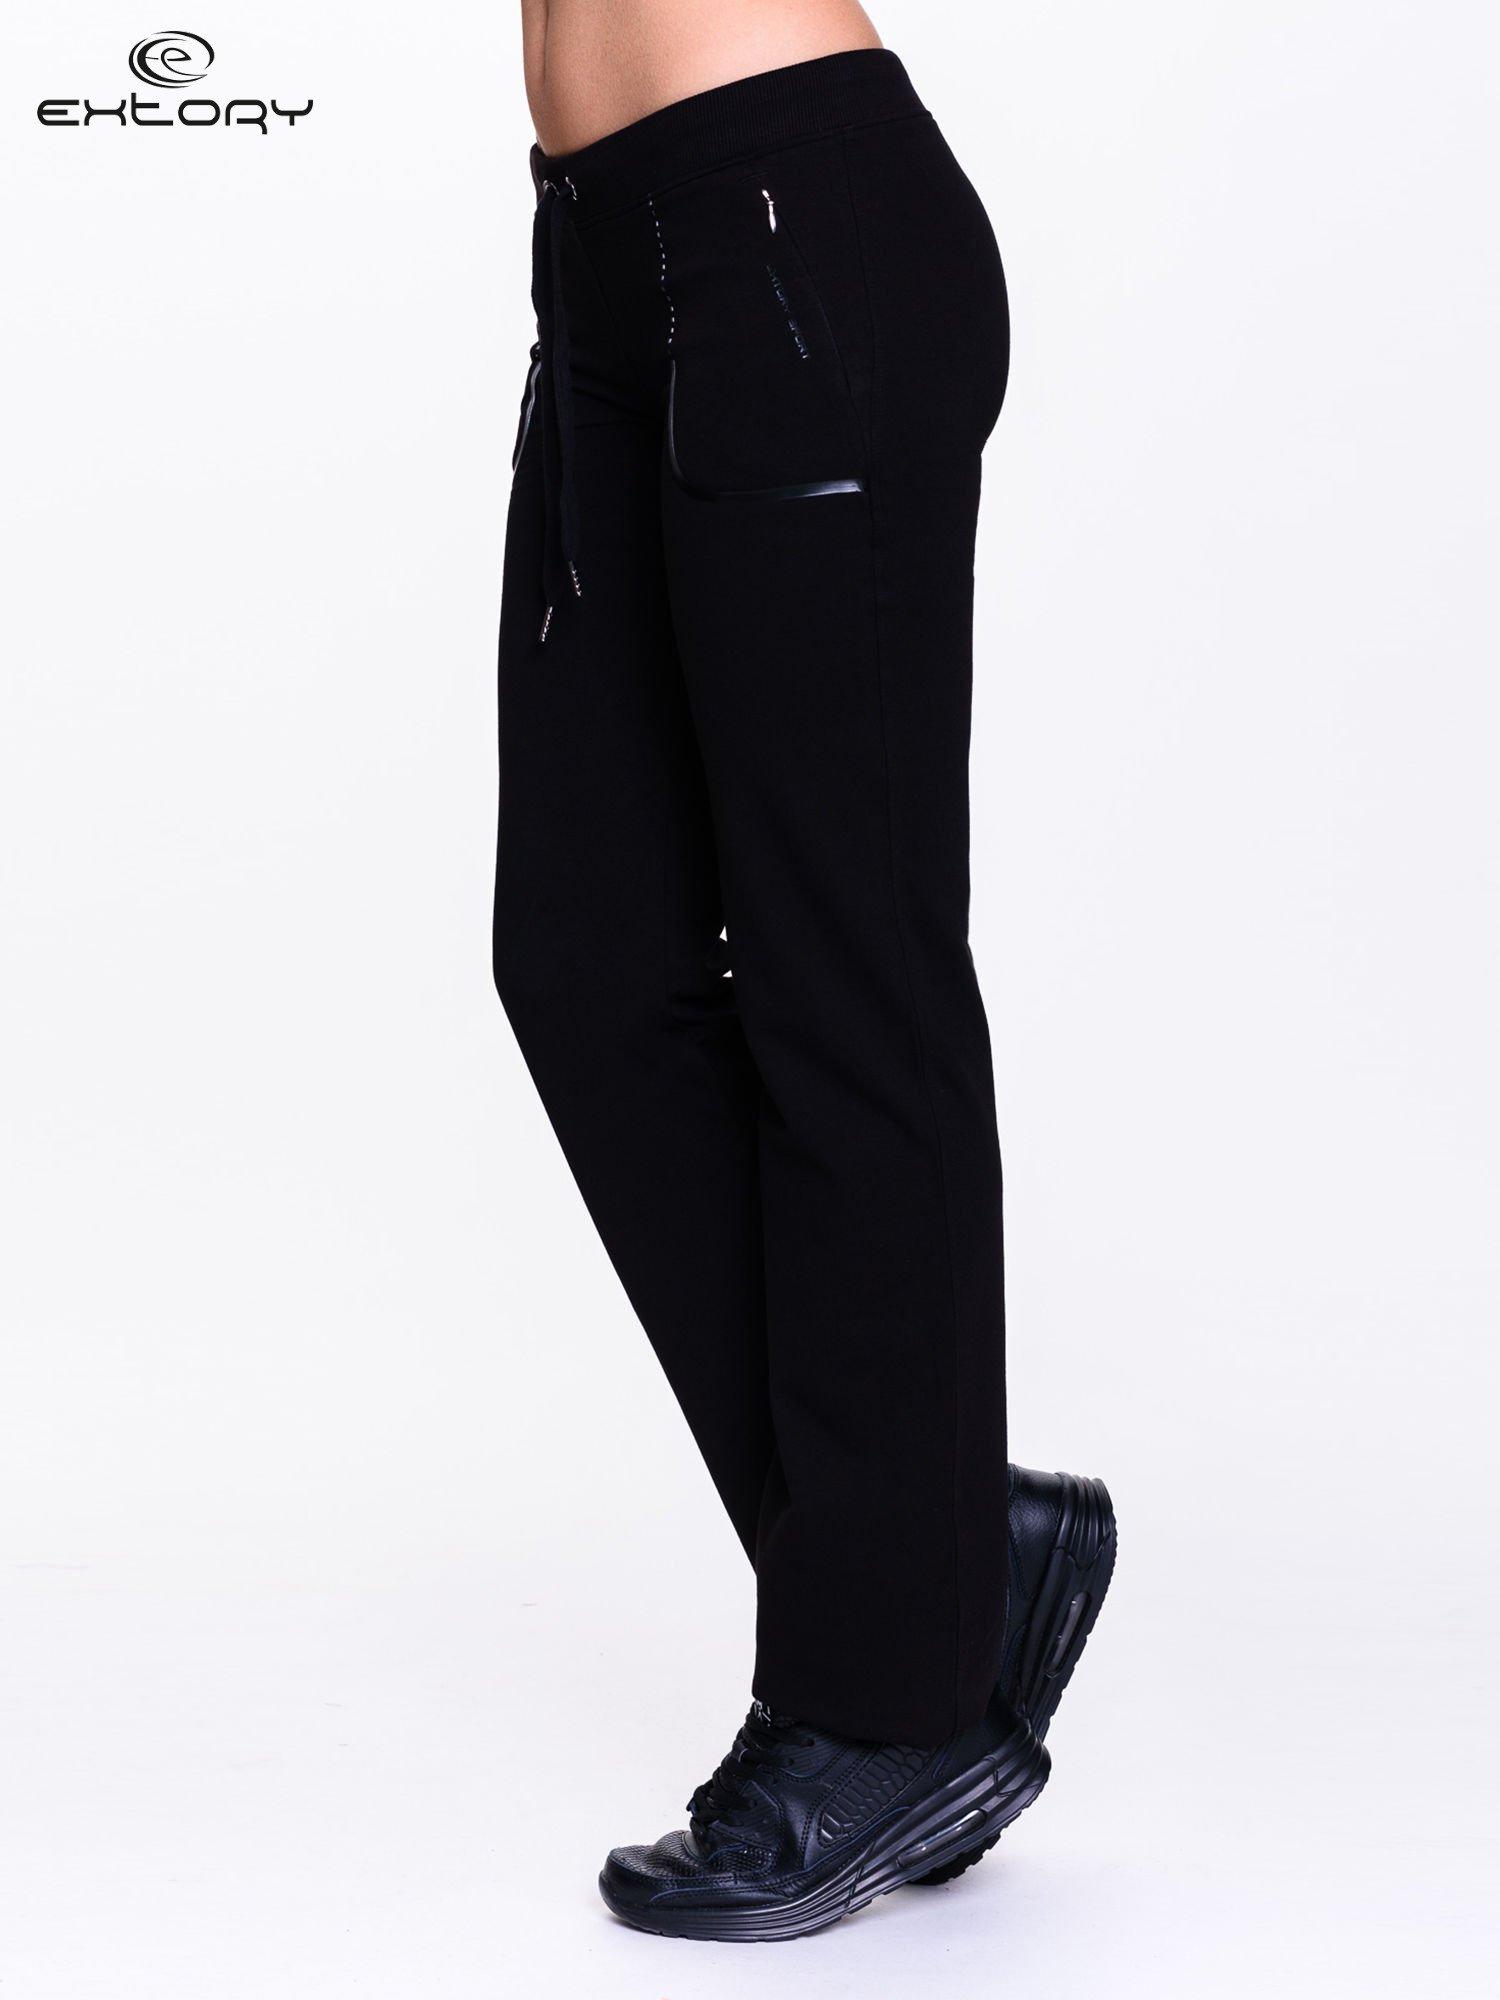 Czarne spodnie dresowe ze skórzaną lamówką                                  zdj.                                  3